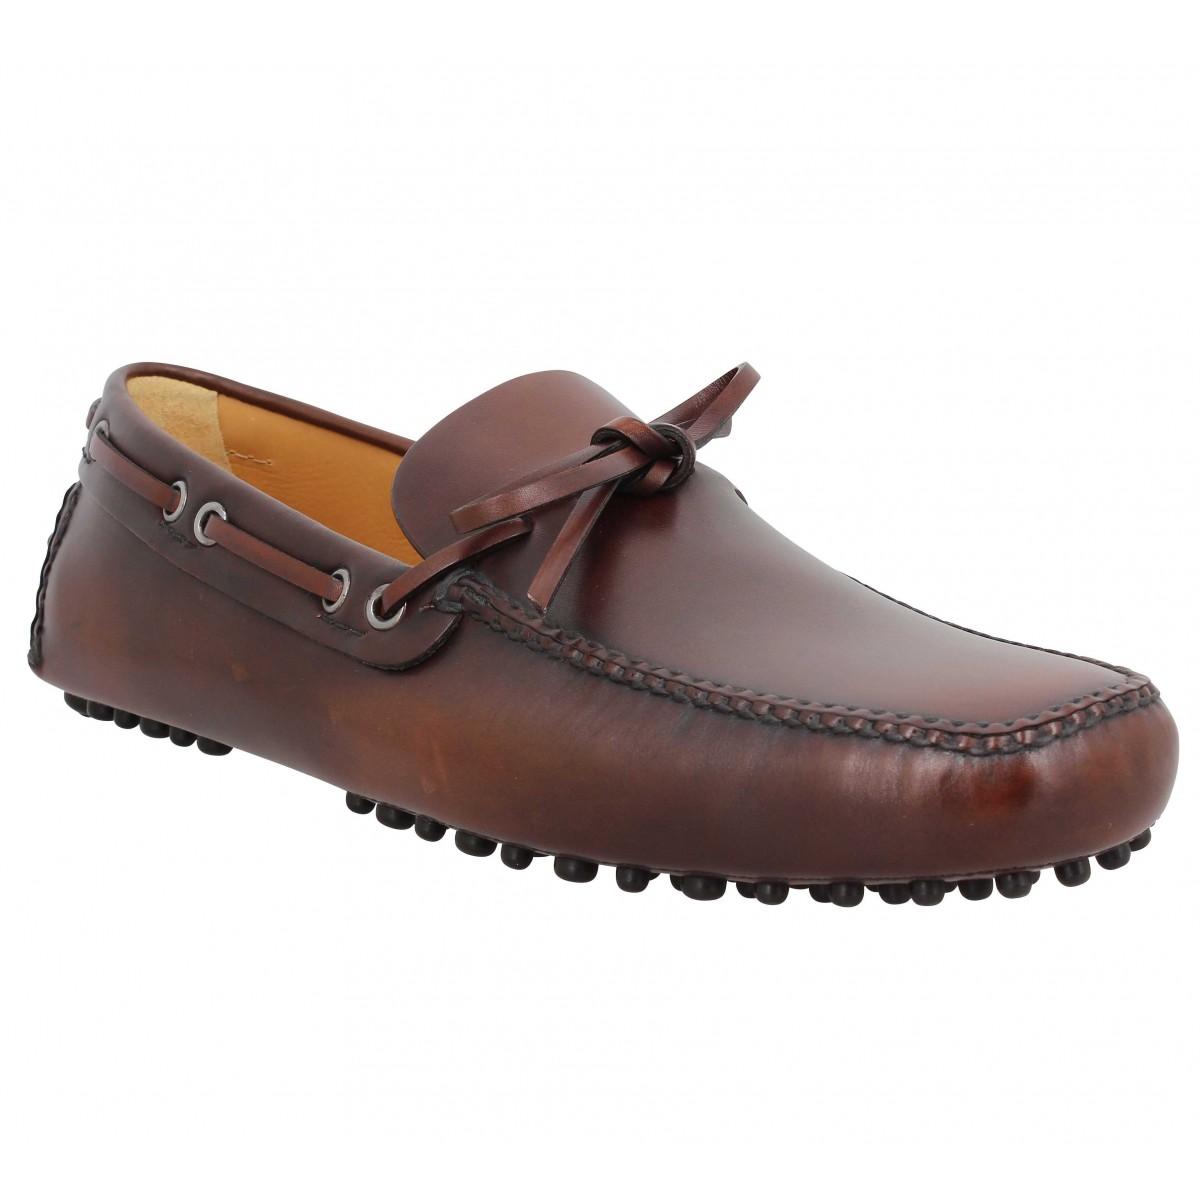 Car Shoe Marque Driving Shoes Cuir...